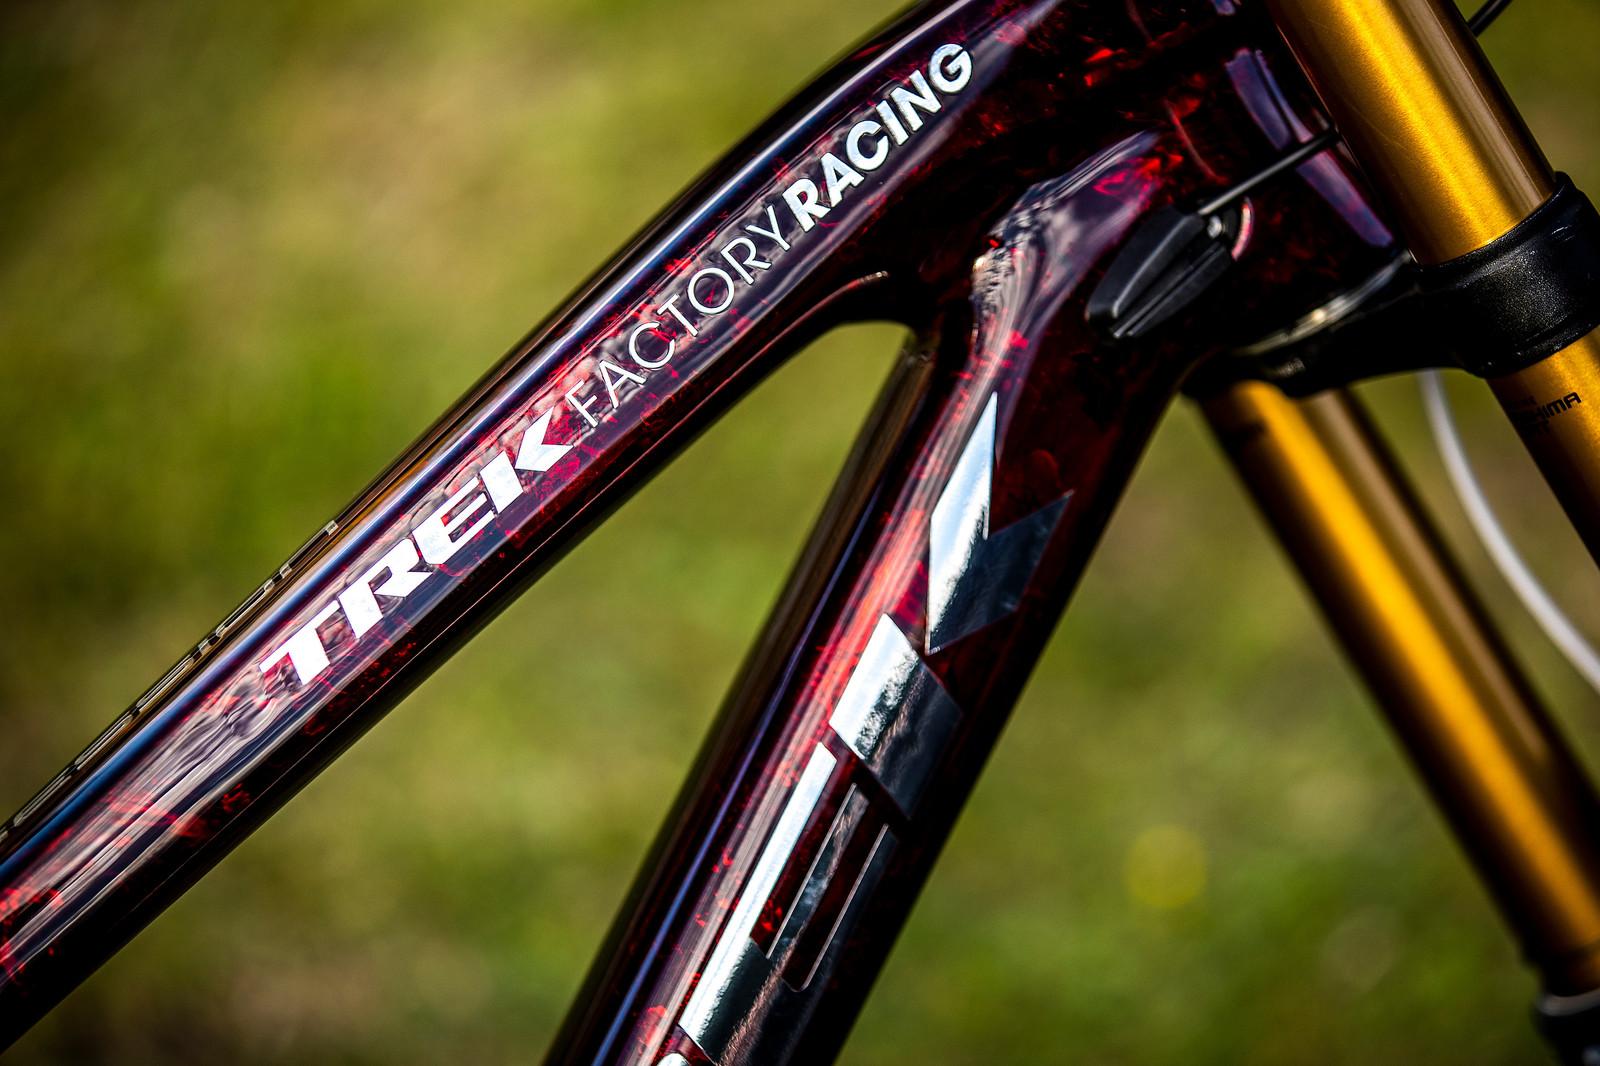 Shiny - WORLD CHAMPS BIKE - Kade Edwards' Trek Session - Mountain Biking Pictures - Vital MTB